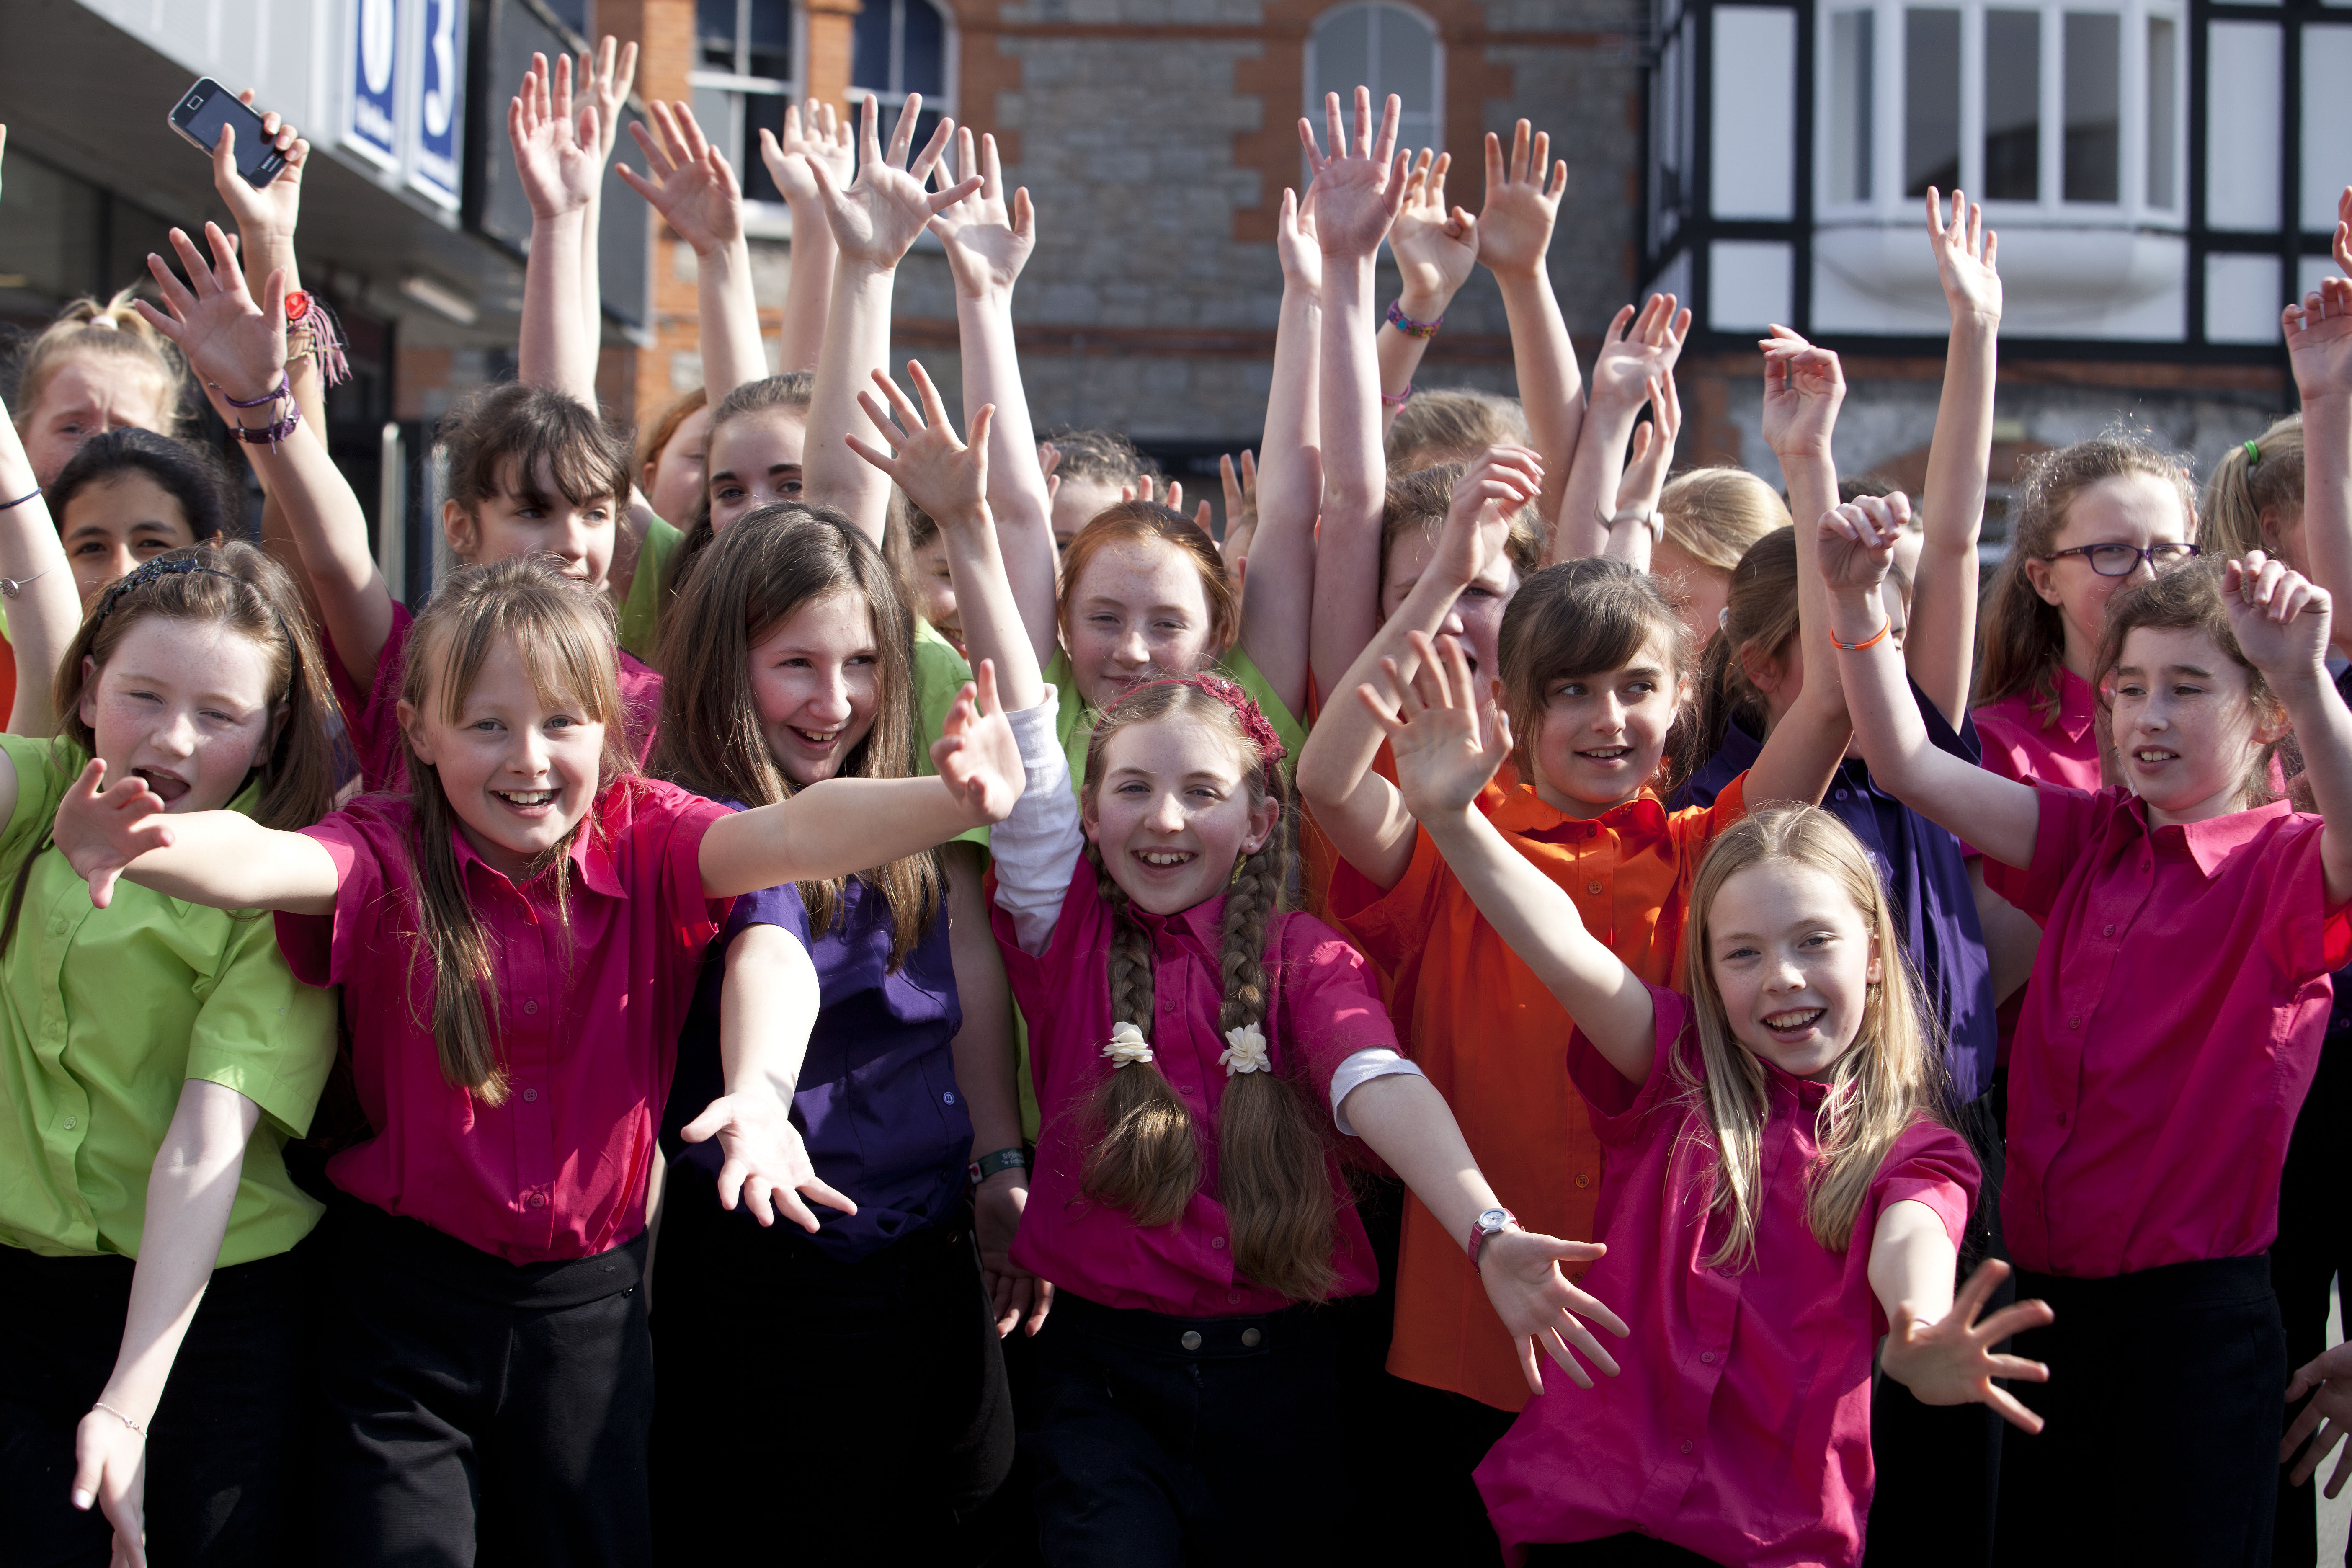 WIT Girls' Choir - WIT Choral Porgramme